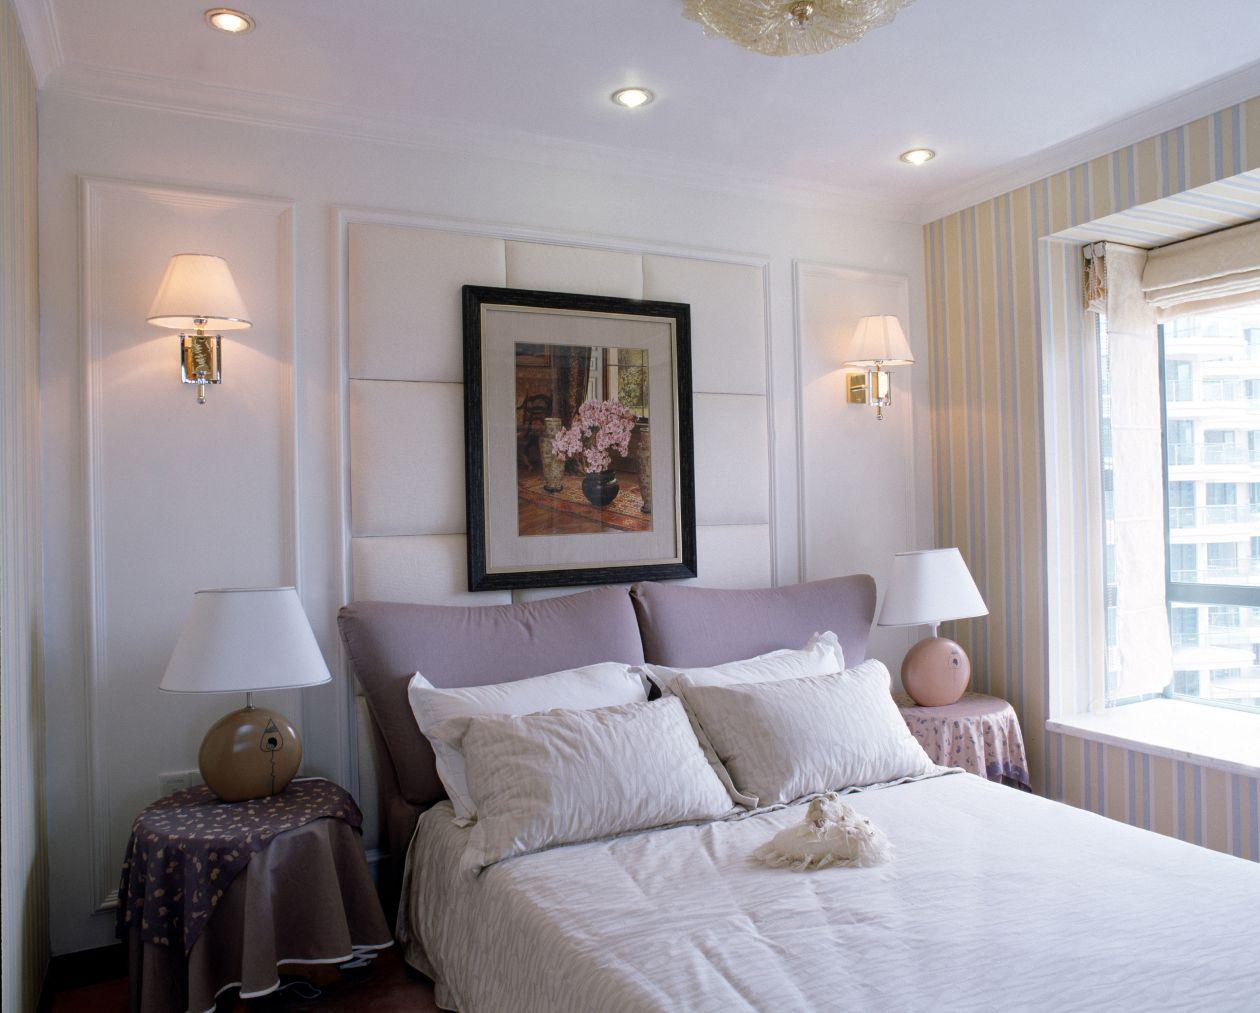 Decoraci n para dormitorios peque os hogar total - Decoracion dormitorios pequenos ...